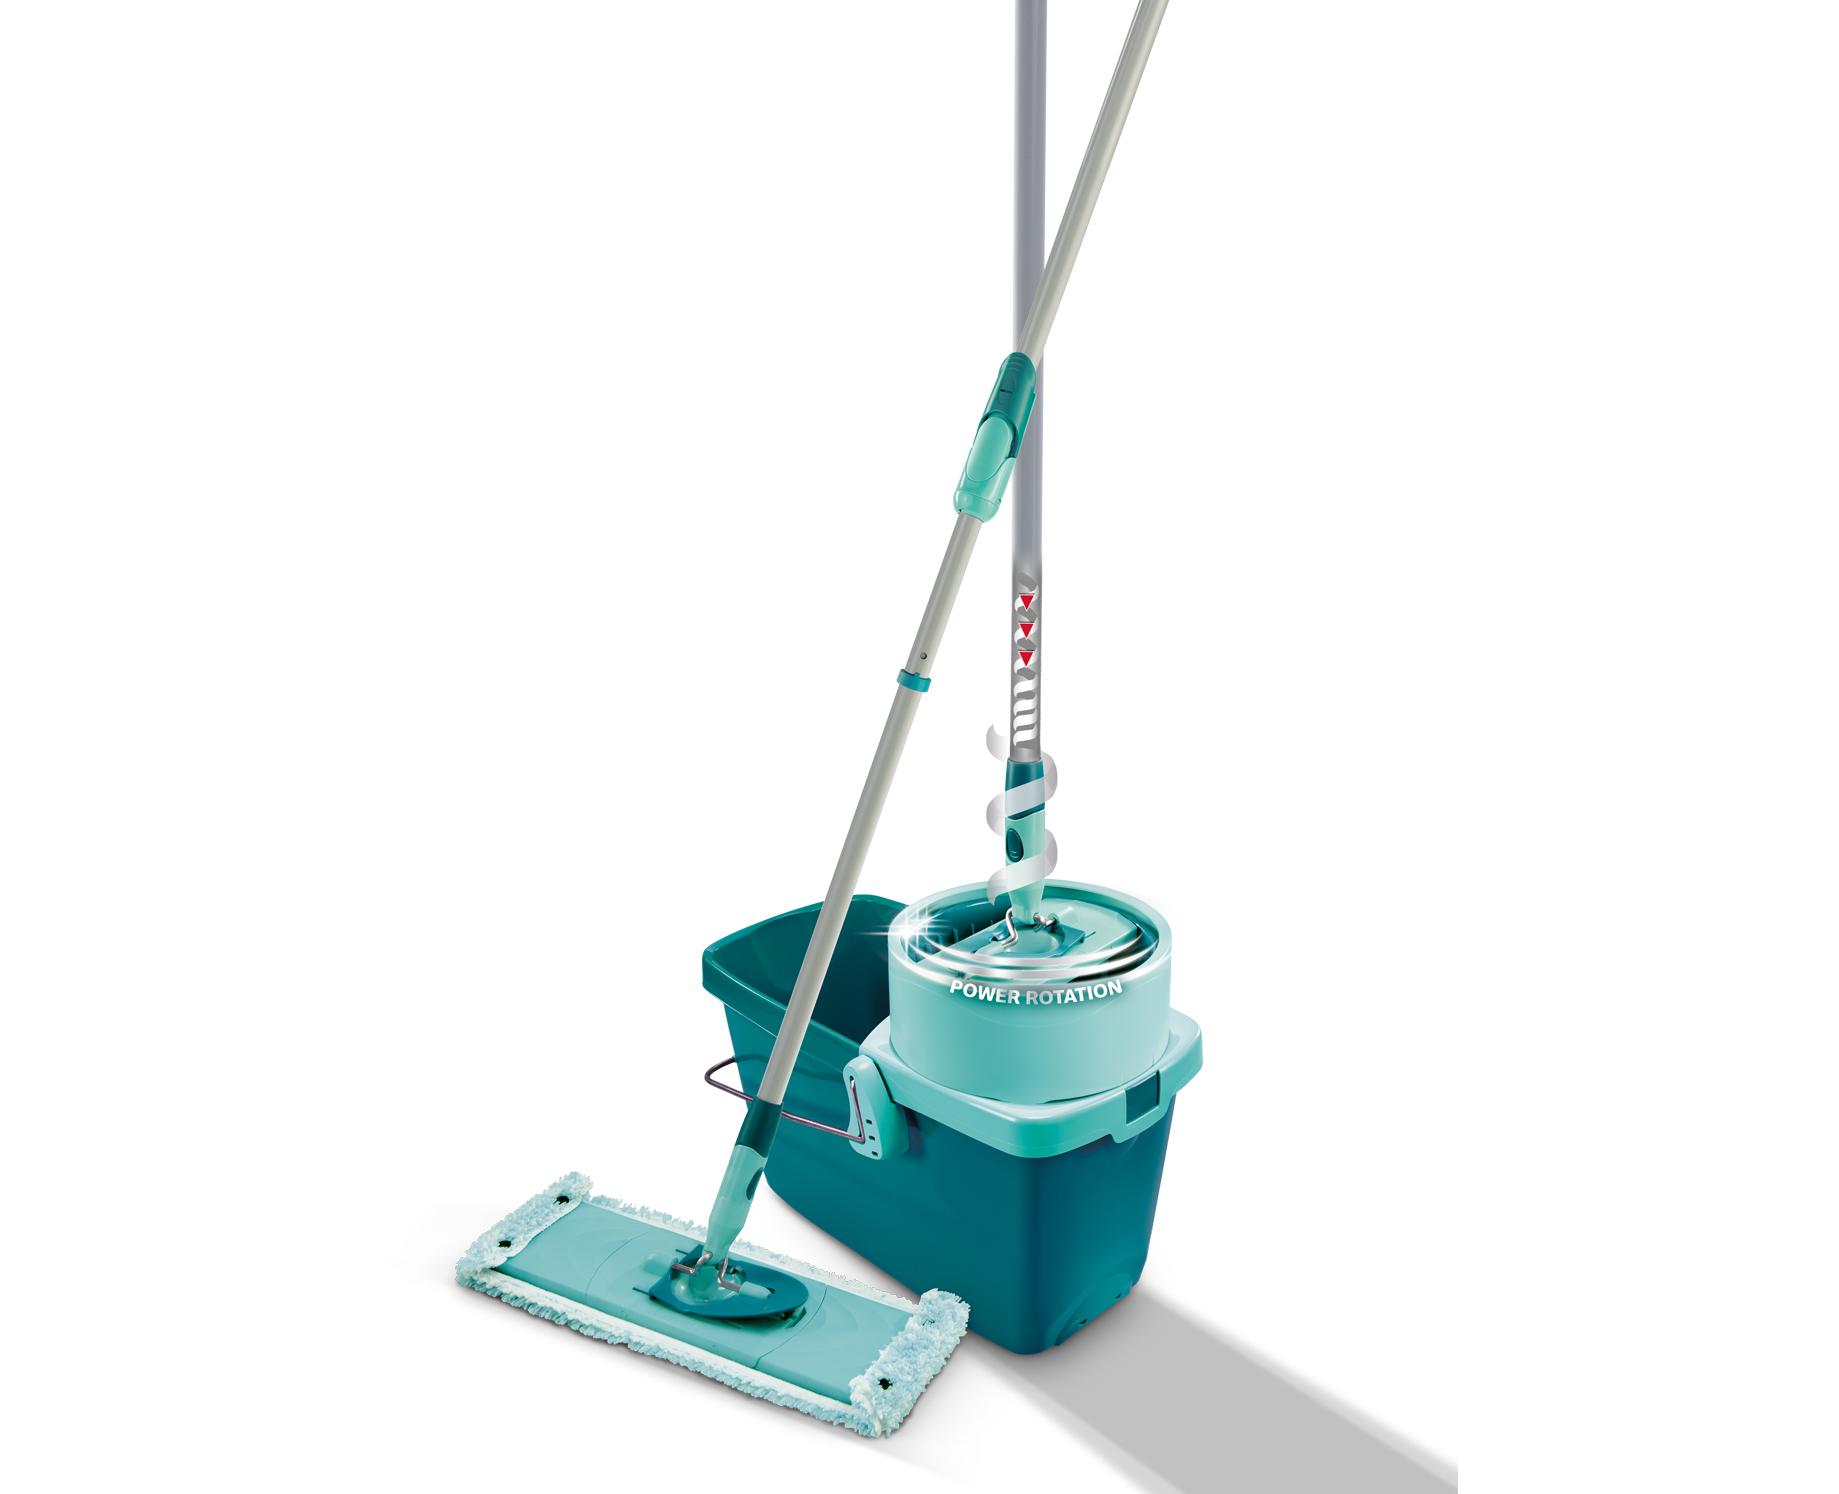 LEIFHEIT Leifheit mop Twist System XL New 52015